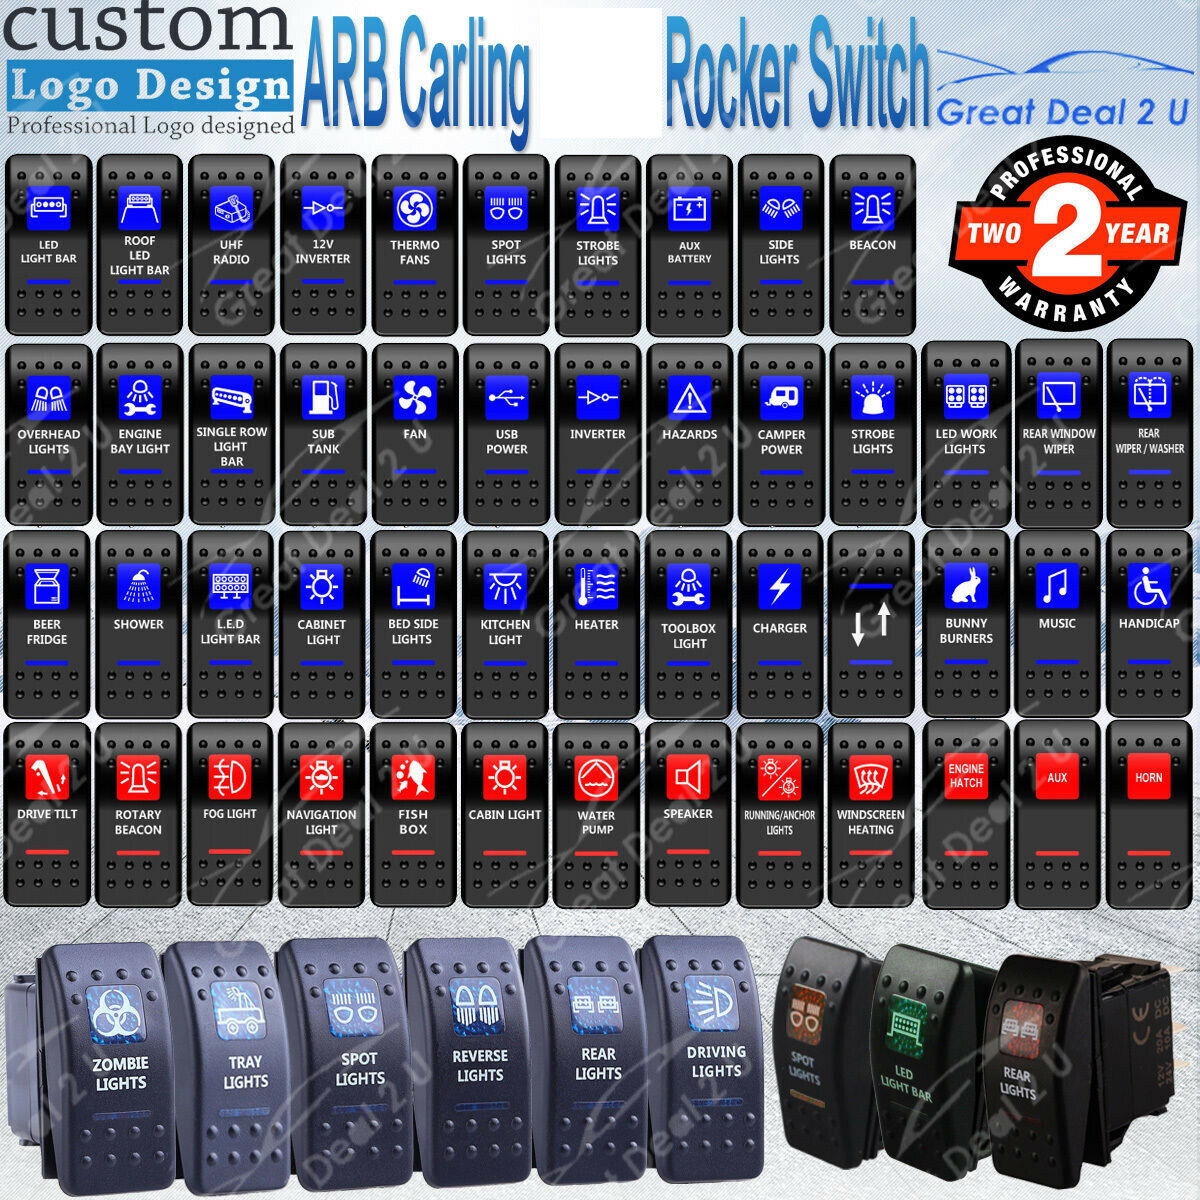 UK Fast Ship LED BACKLIT ROCKER SWITCH BLUE LED CARLING STYLE SWITCH WINCH